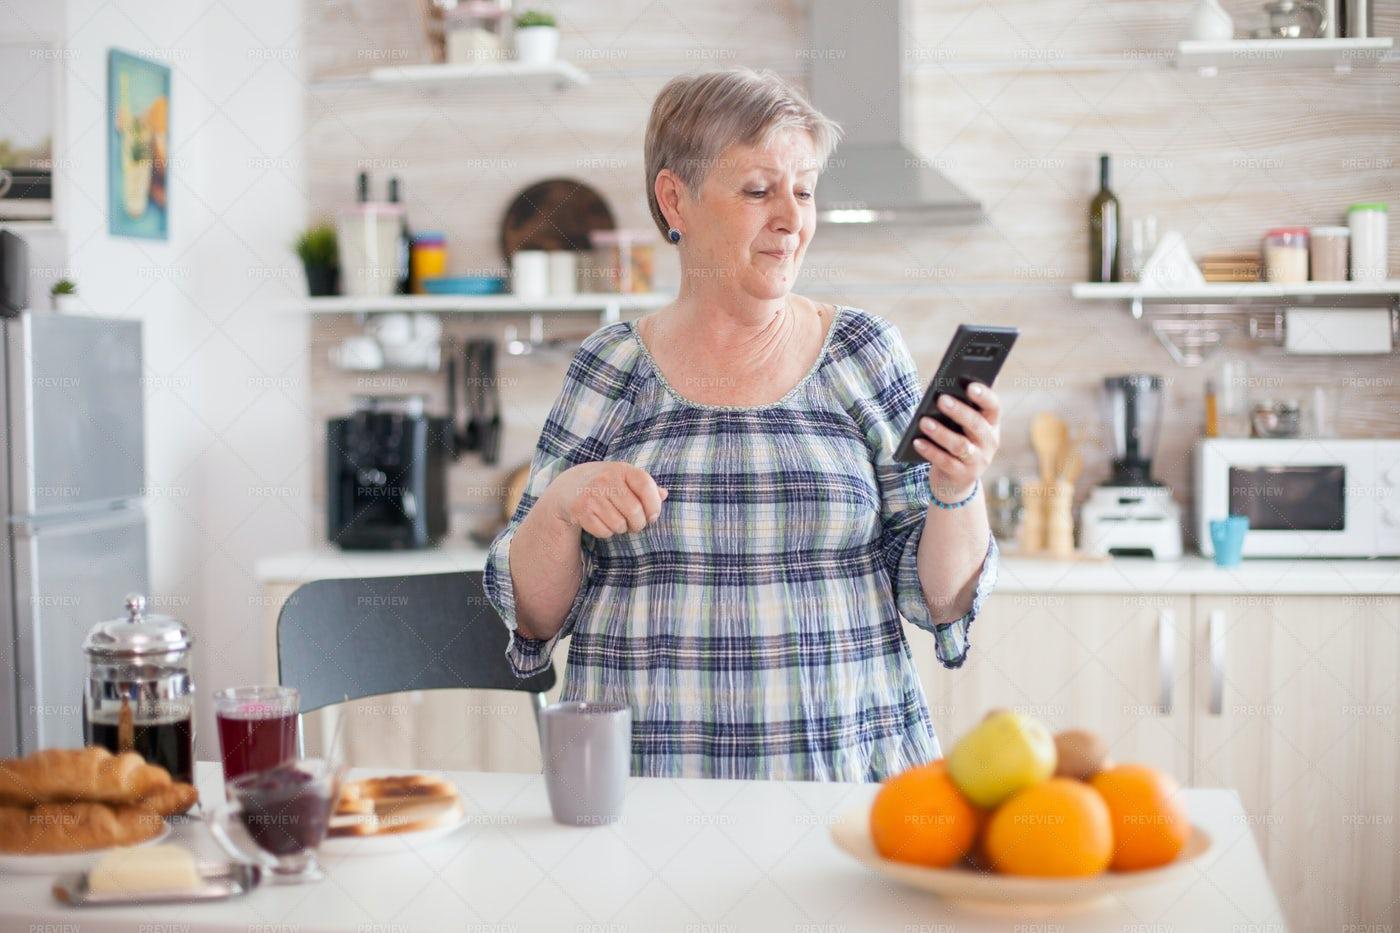 Senior Woman Smiling With Smartphone: Stock Photos